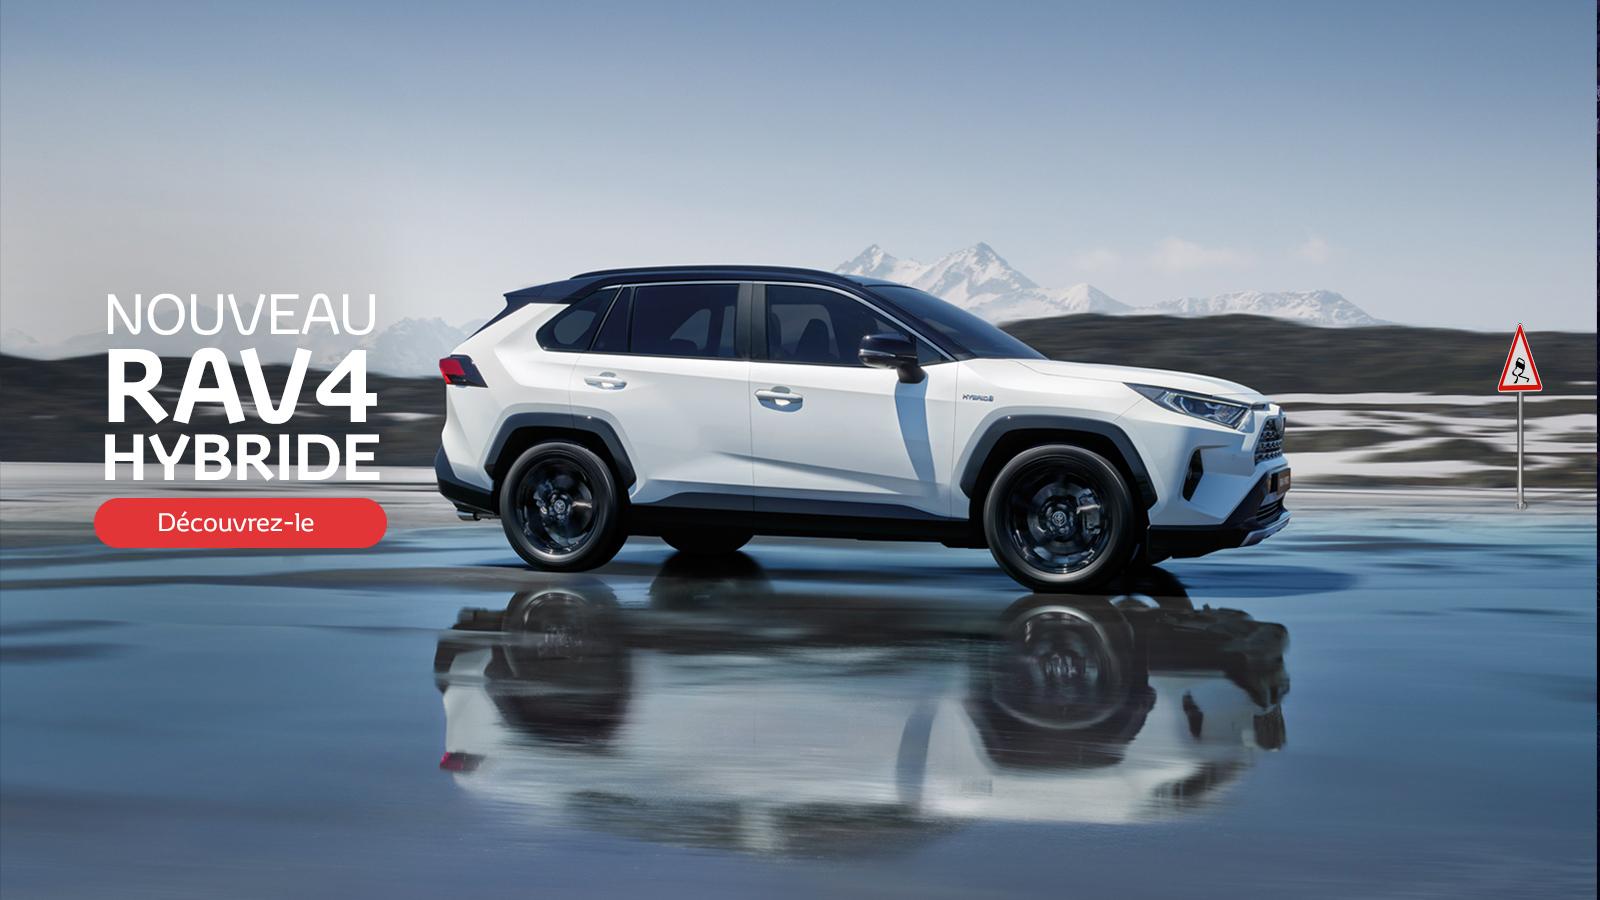 Toyota Voitures Neuves Occasions Hybrides Et Entreprise